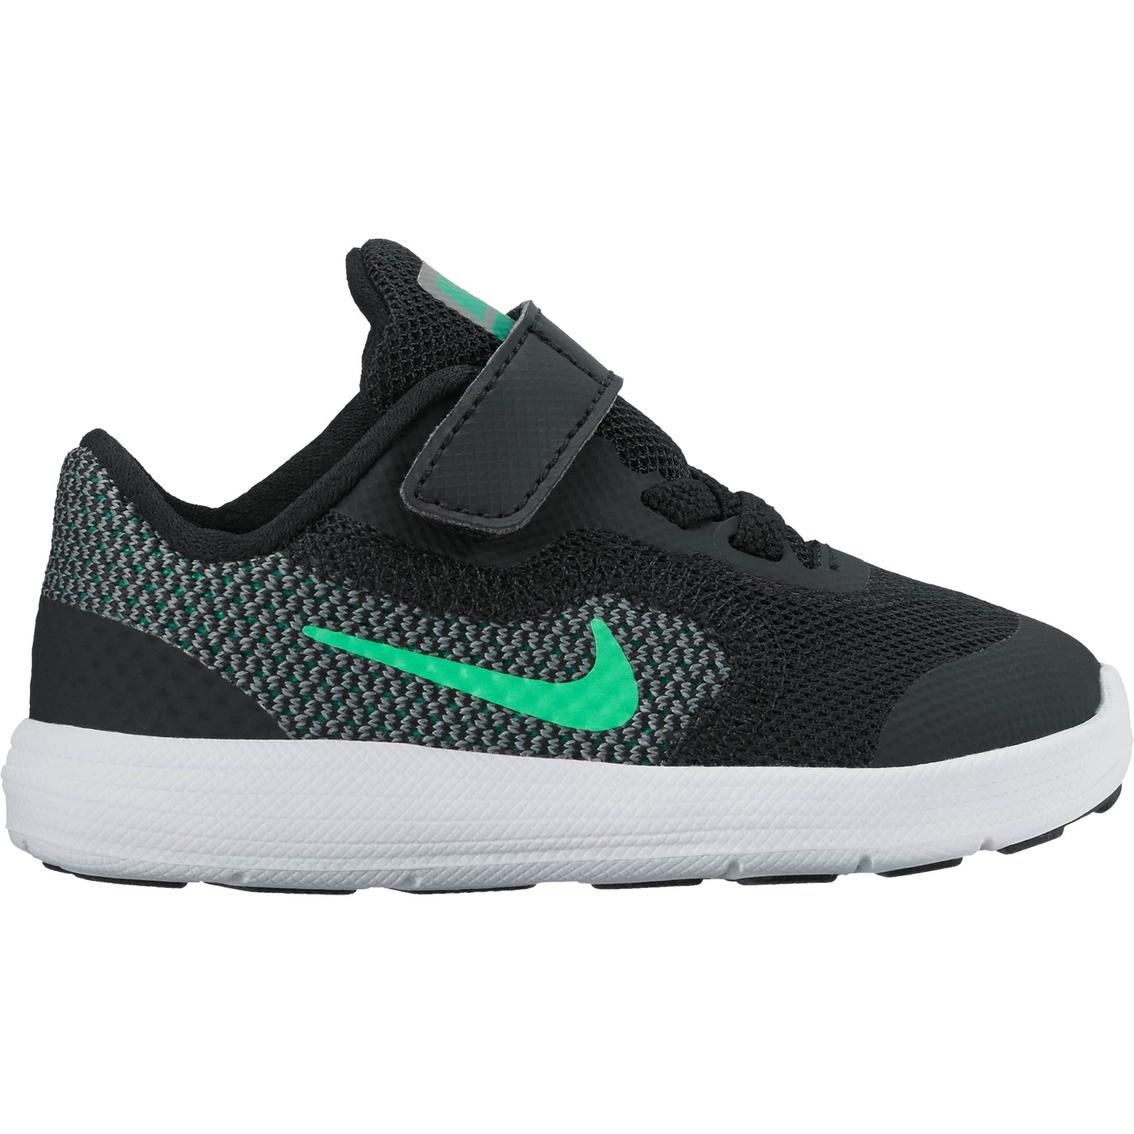 318fa5c3b9d Nike Toddler Boys Revolution 3 Running Shoes